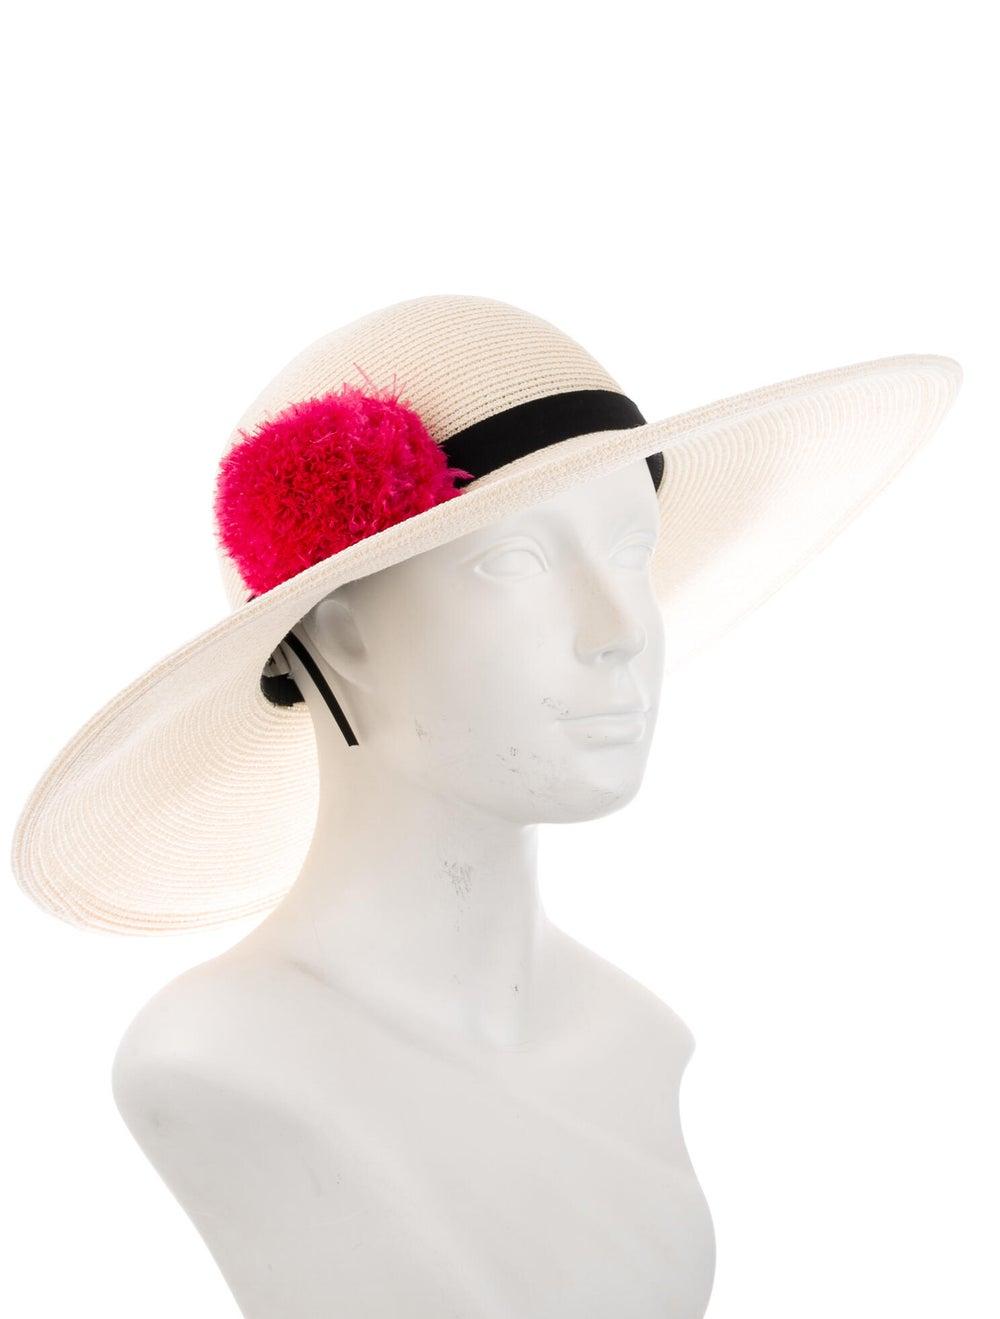 Eugenia Kim Straw Wide Brim Hat - image 3